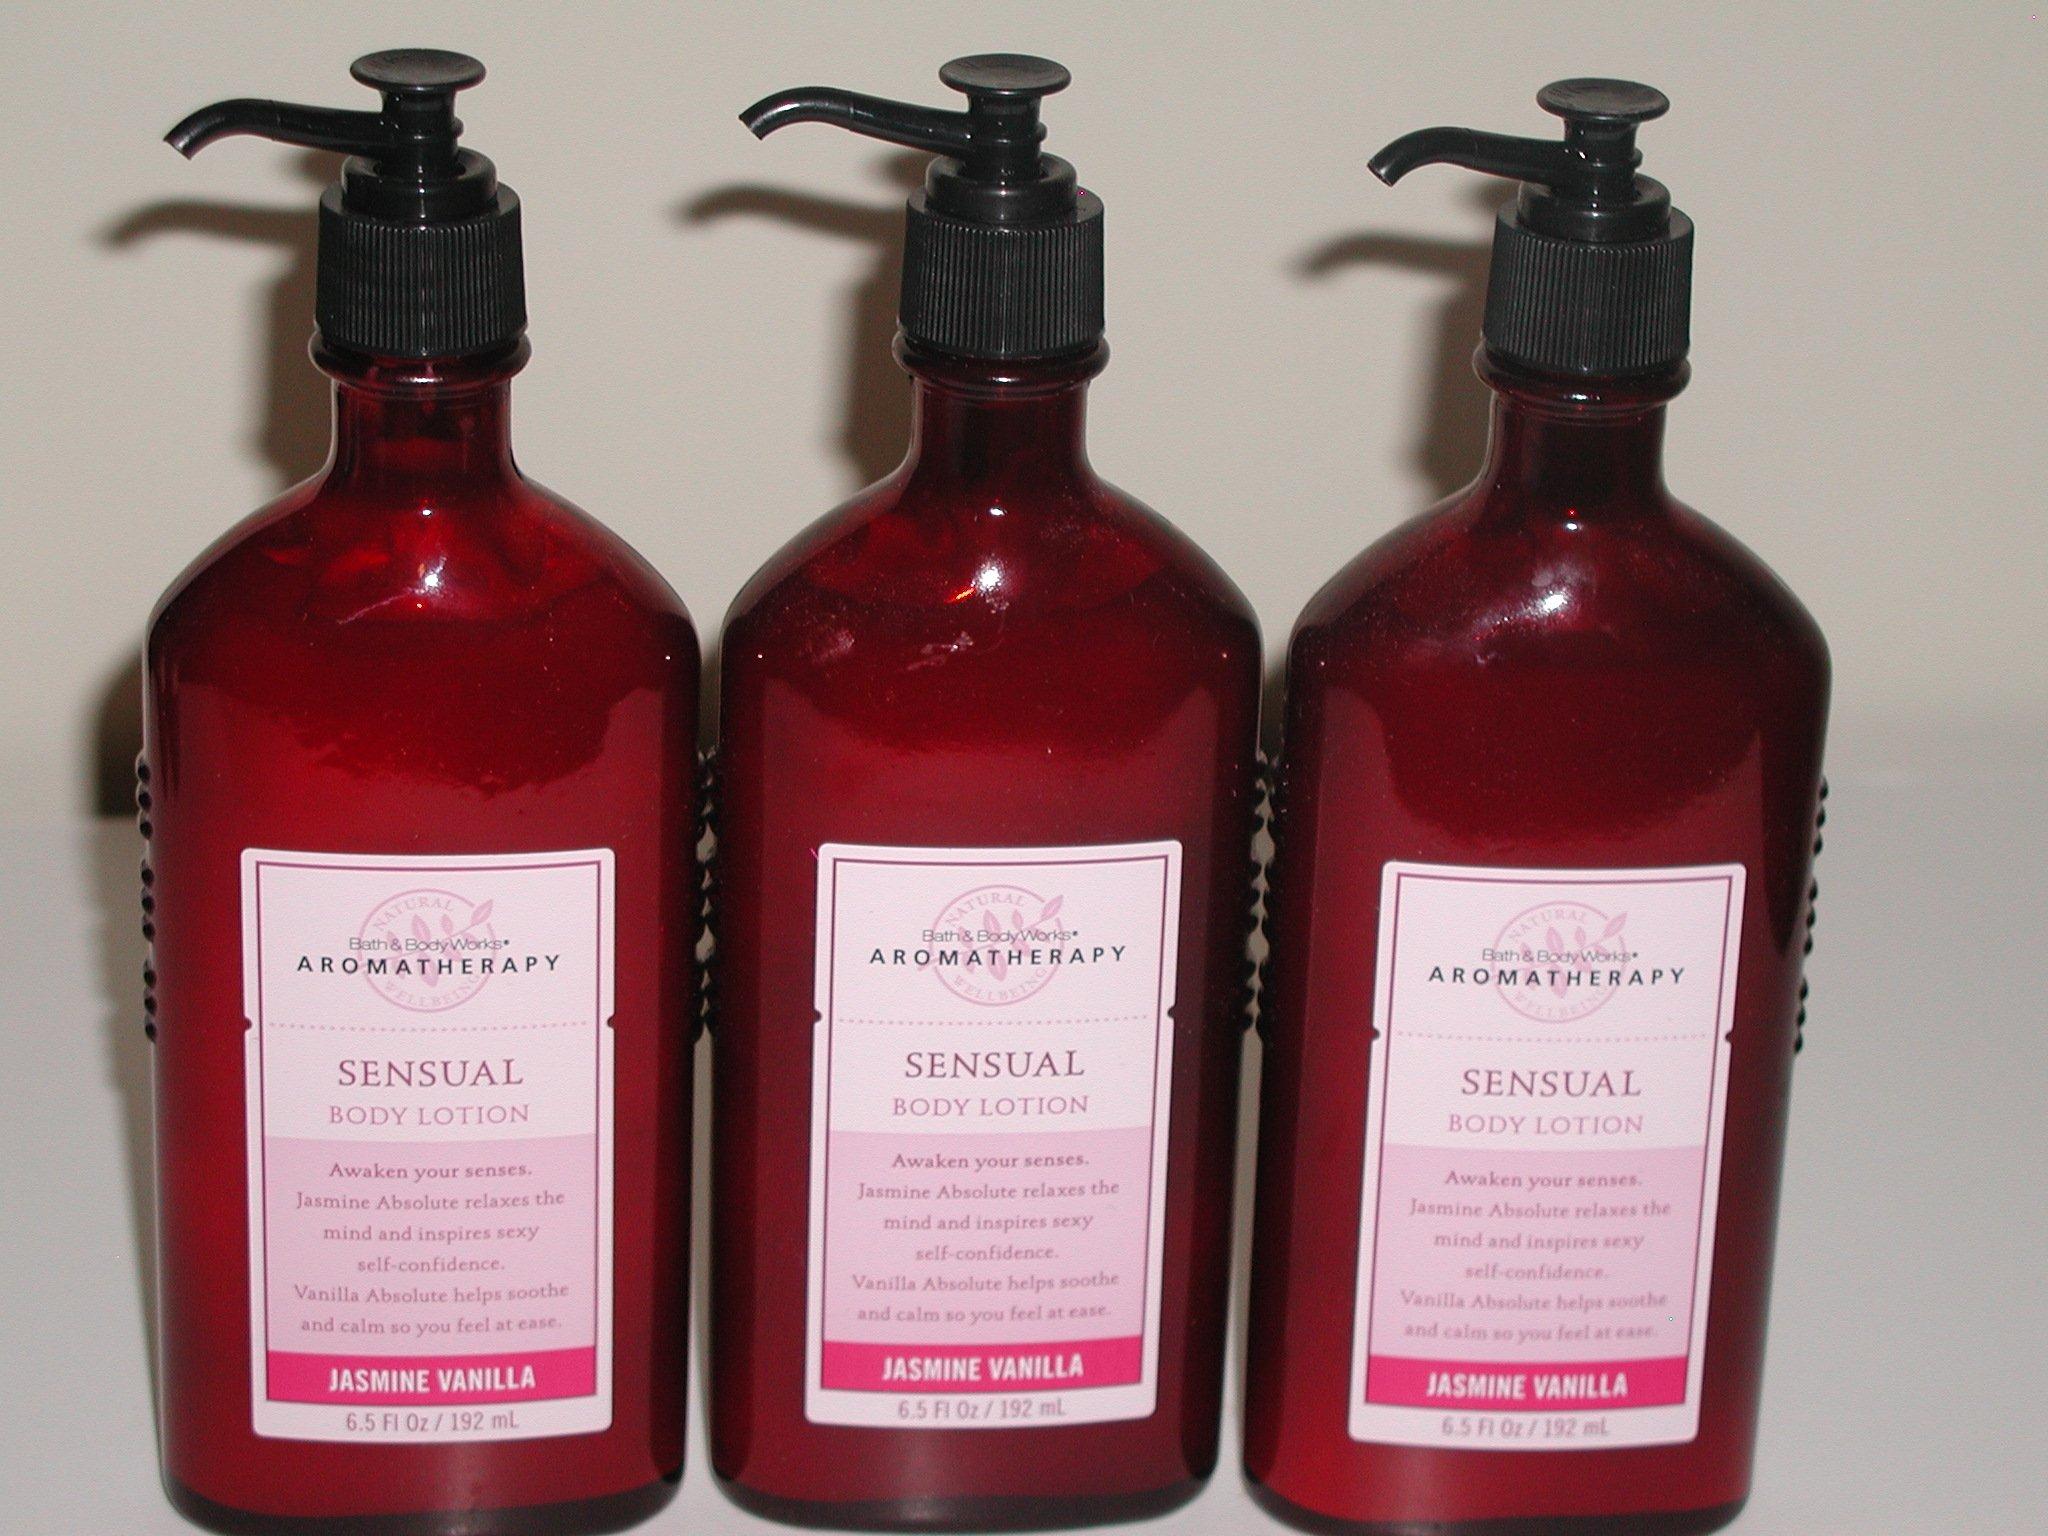 Lot of 3 Bath & Body Works Aromatherapy Jasmine Vanilla Body Lotion 6.5 fl oz (Jasmine Vanilla)